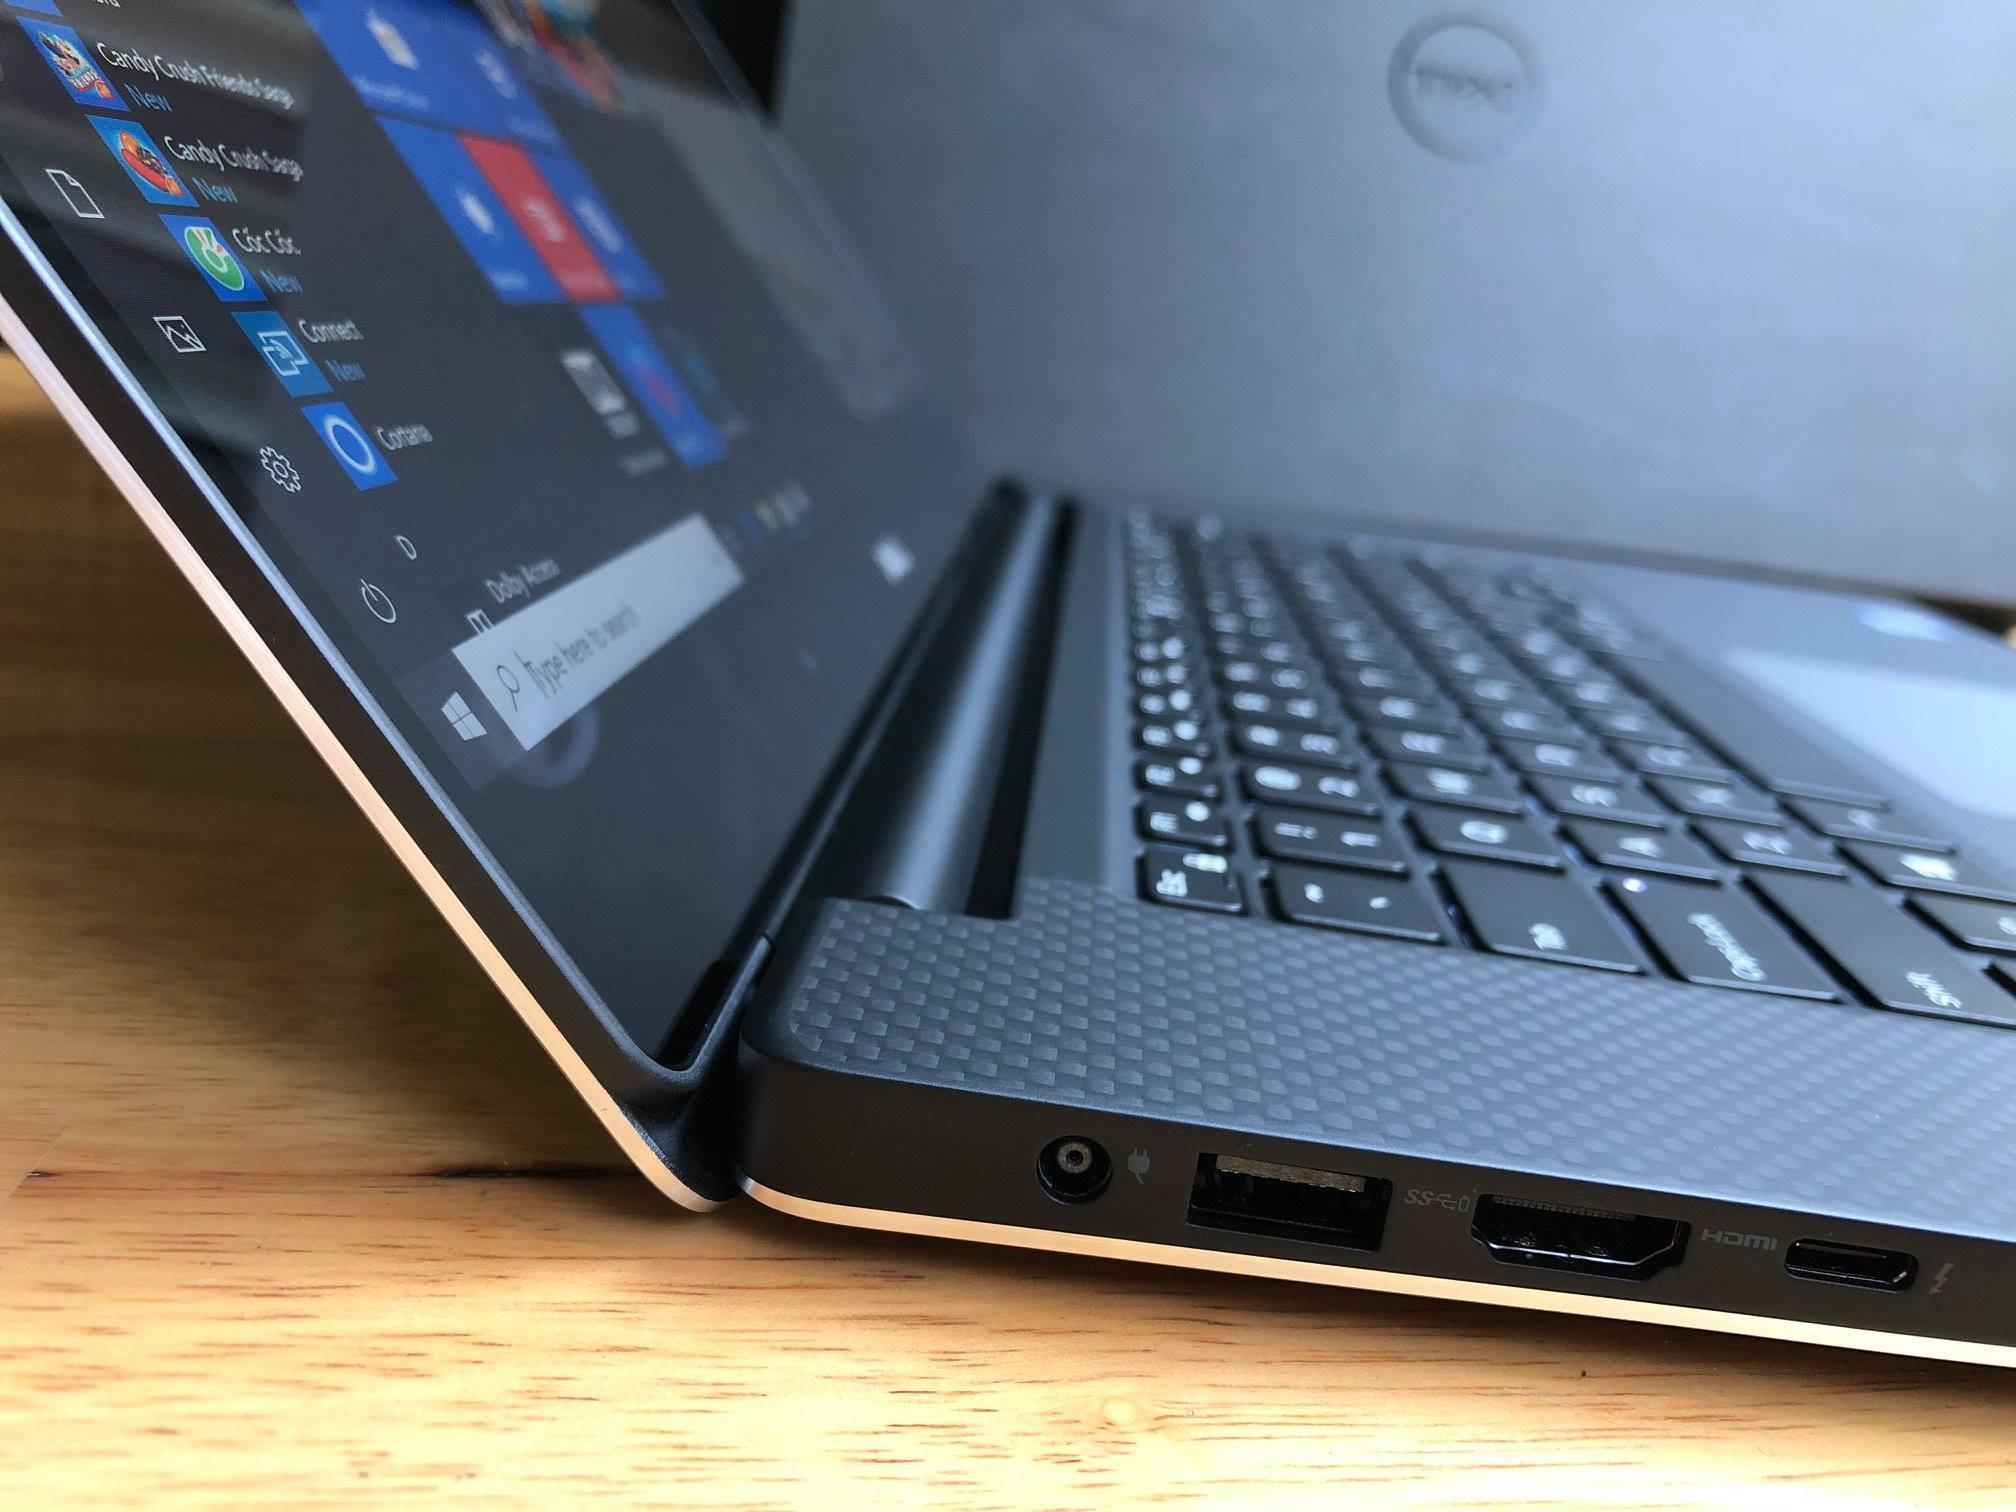 ==> bán 50 cái laptop Dell ... Core i3, i5, i7 ...máy đẹp, zin all. - 29